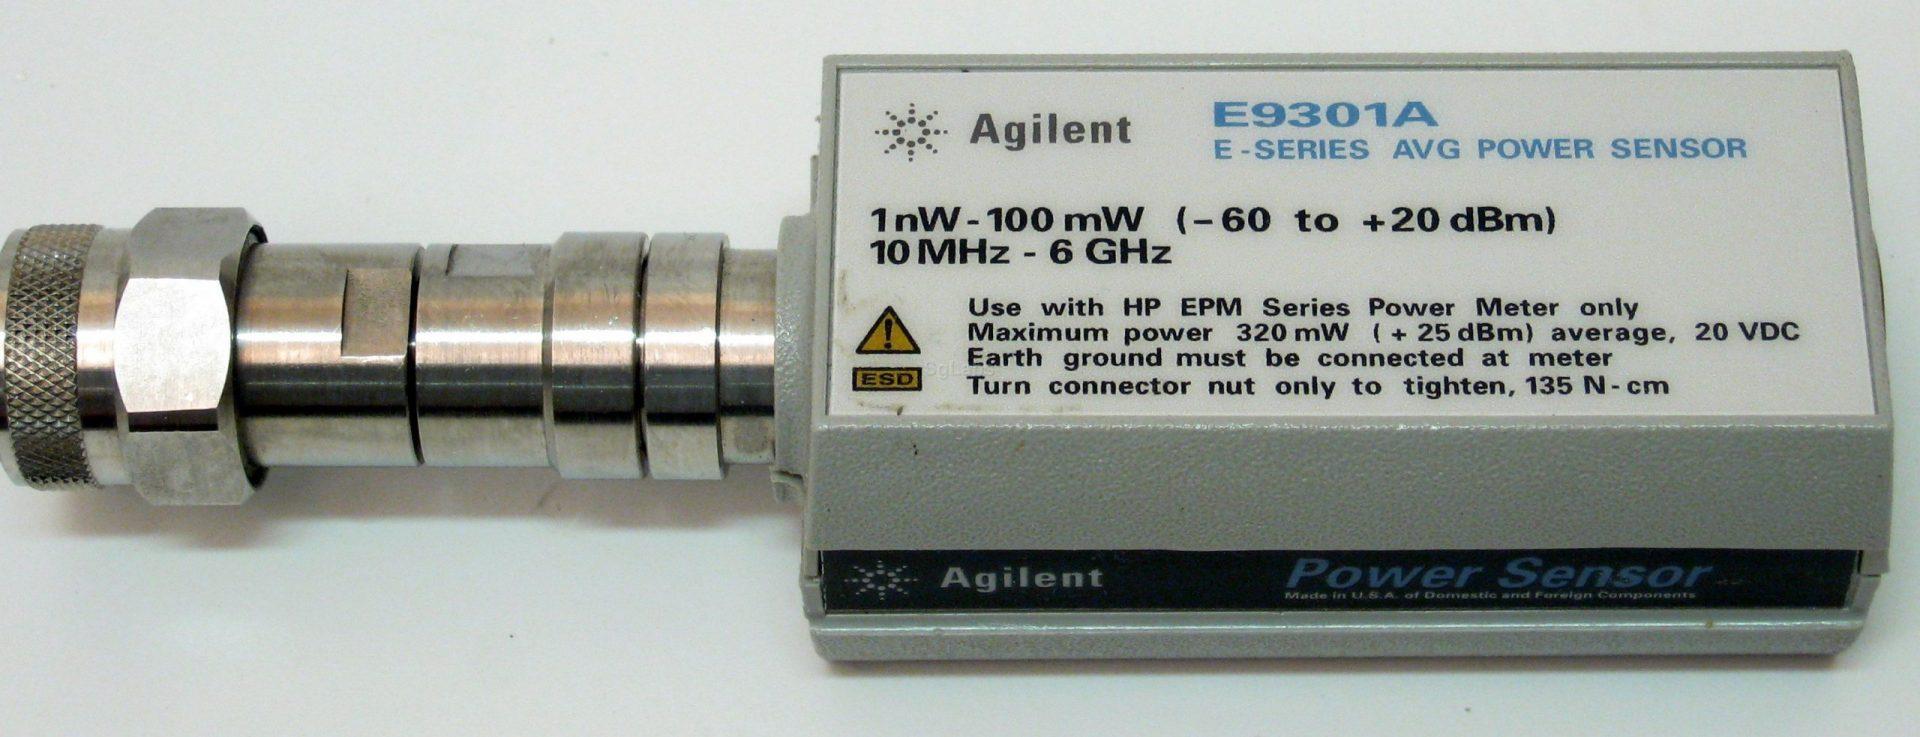 Keysight E9301A E-Series Average Power Sensor 10Mhz-6Ghz